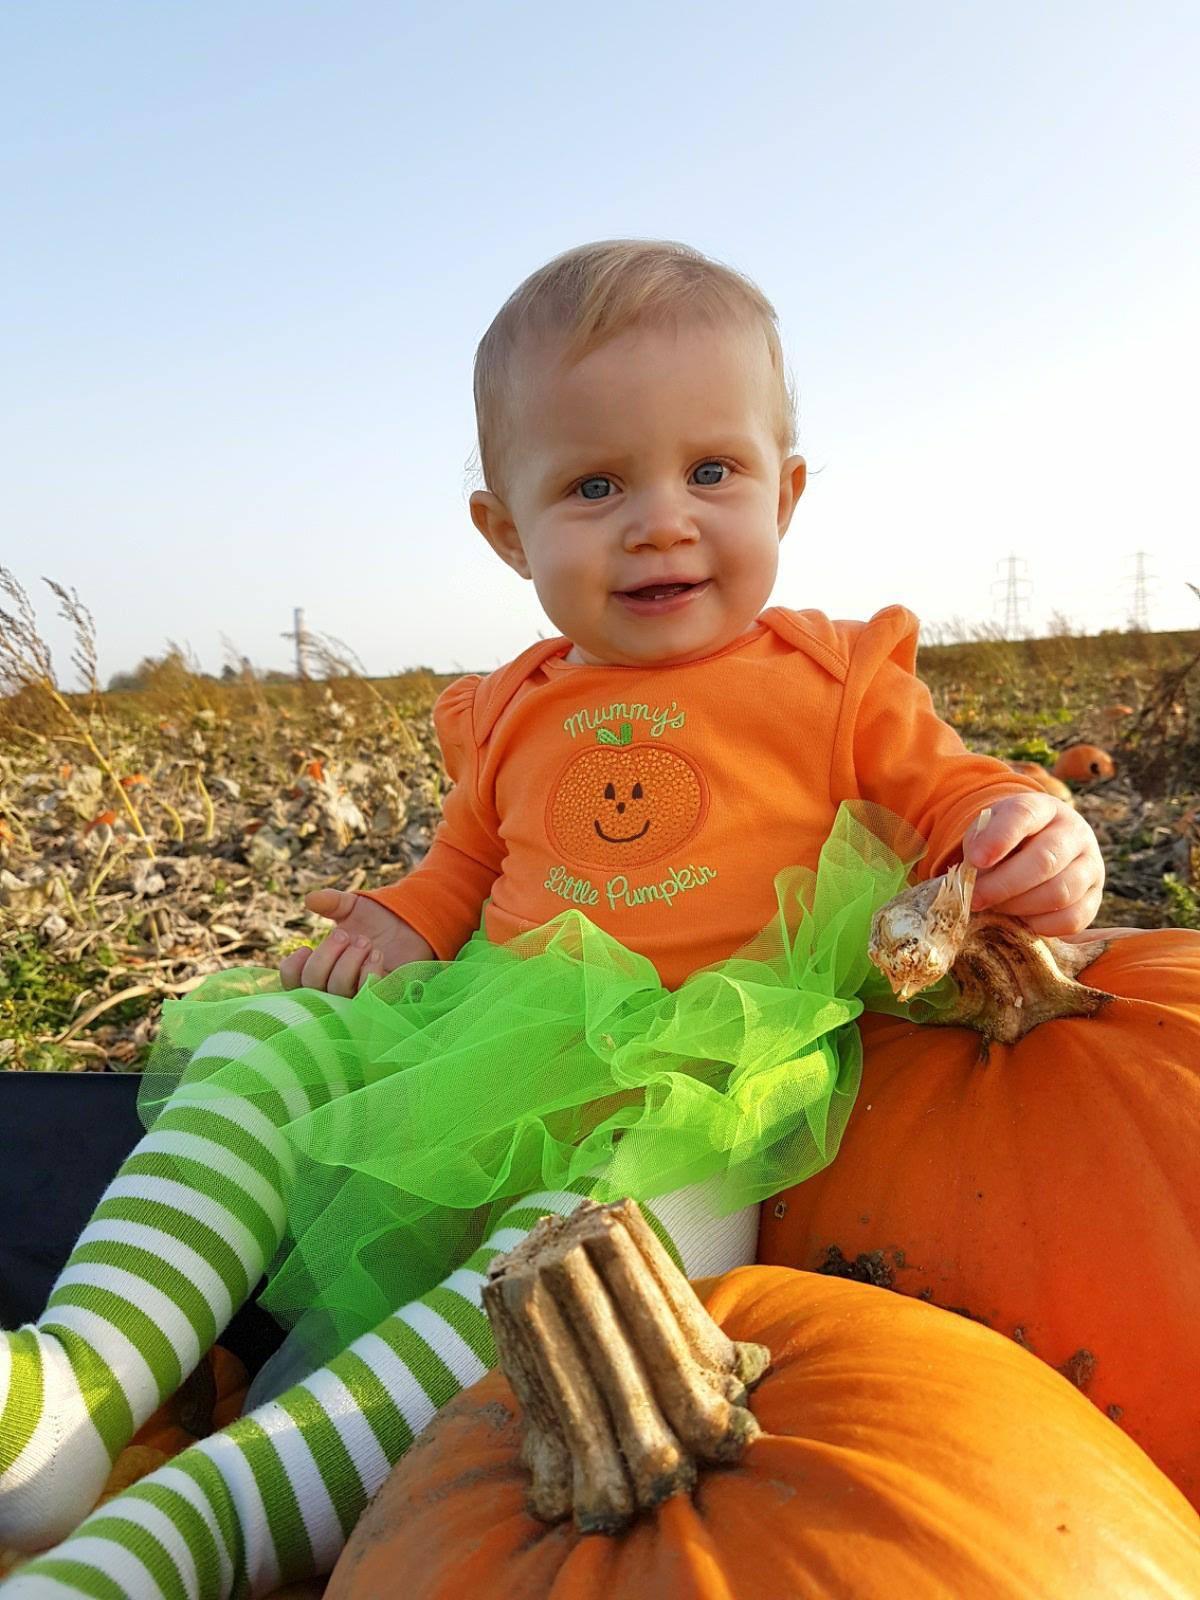 Beluncle Farm pumpkin picking in Kent